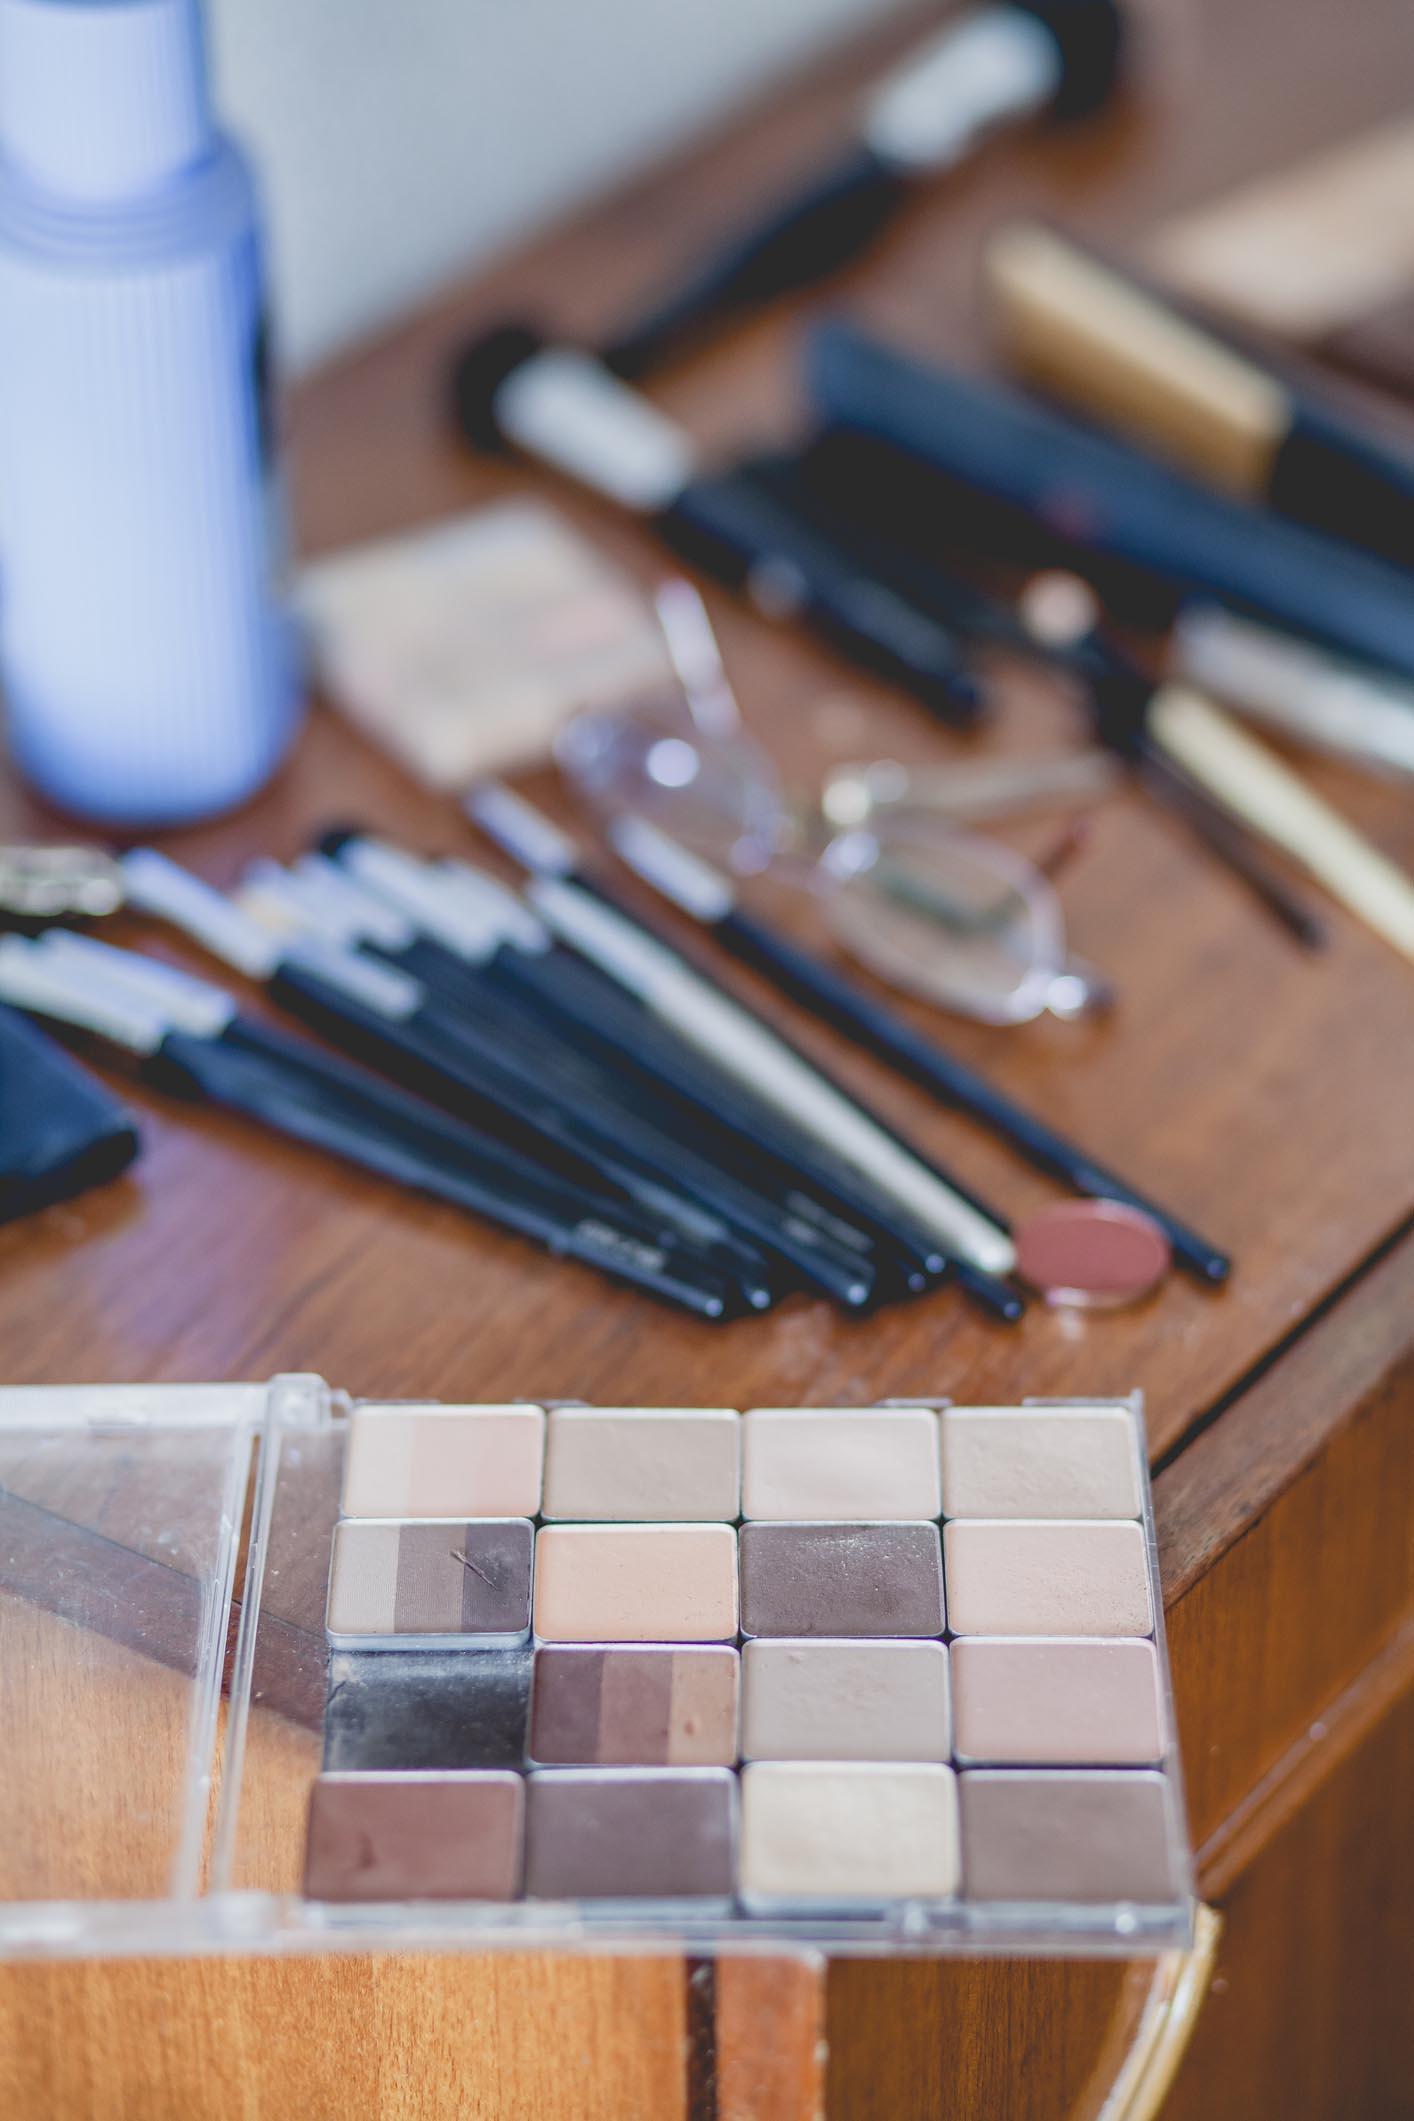 Картинки по запросу Спальня bedroom Decoration disasters: Remove This From Your Bedroom Immediately 1472569558 bedroom old makeup